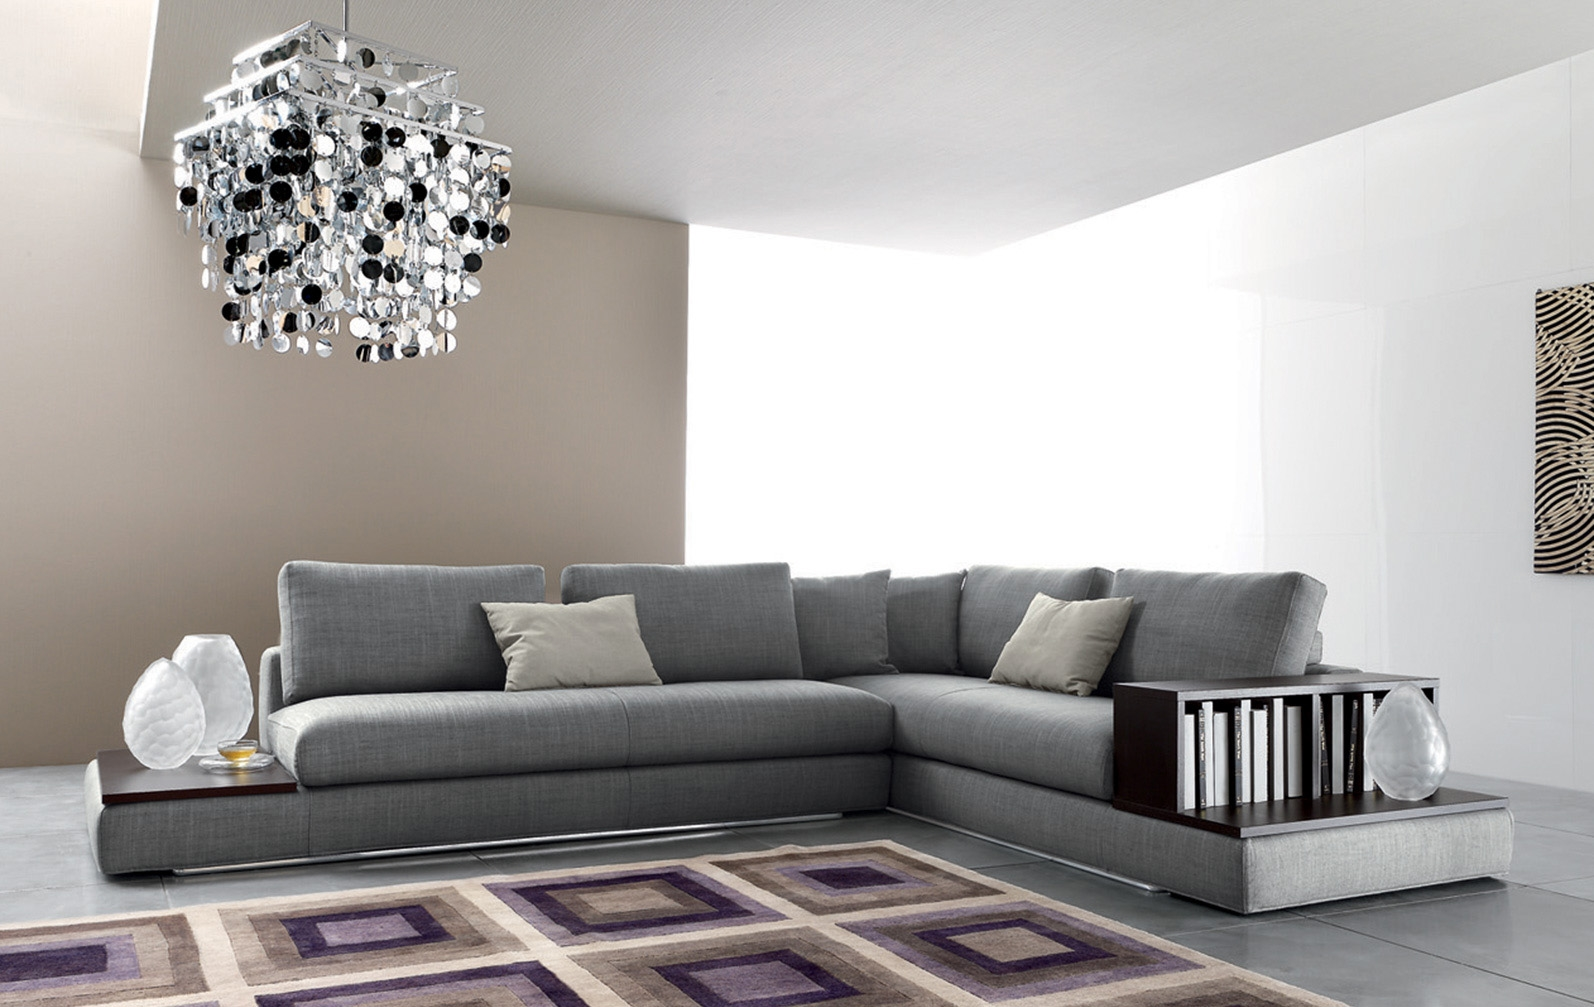 Divano ditre italia modello bijoux divani a prezzi scontati for Prezzi divani moderni